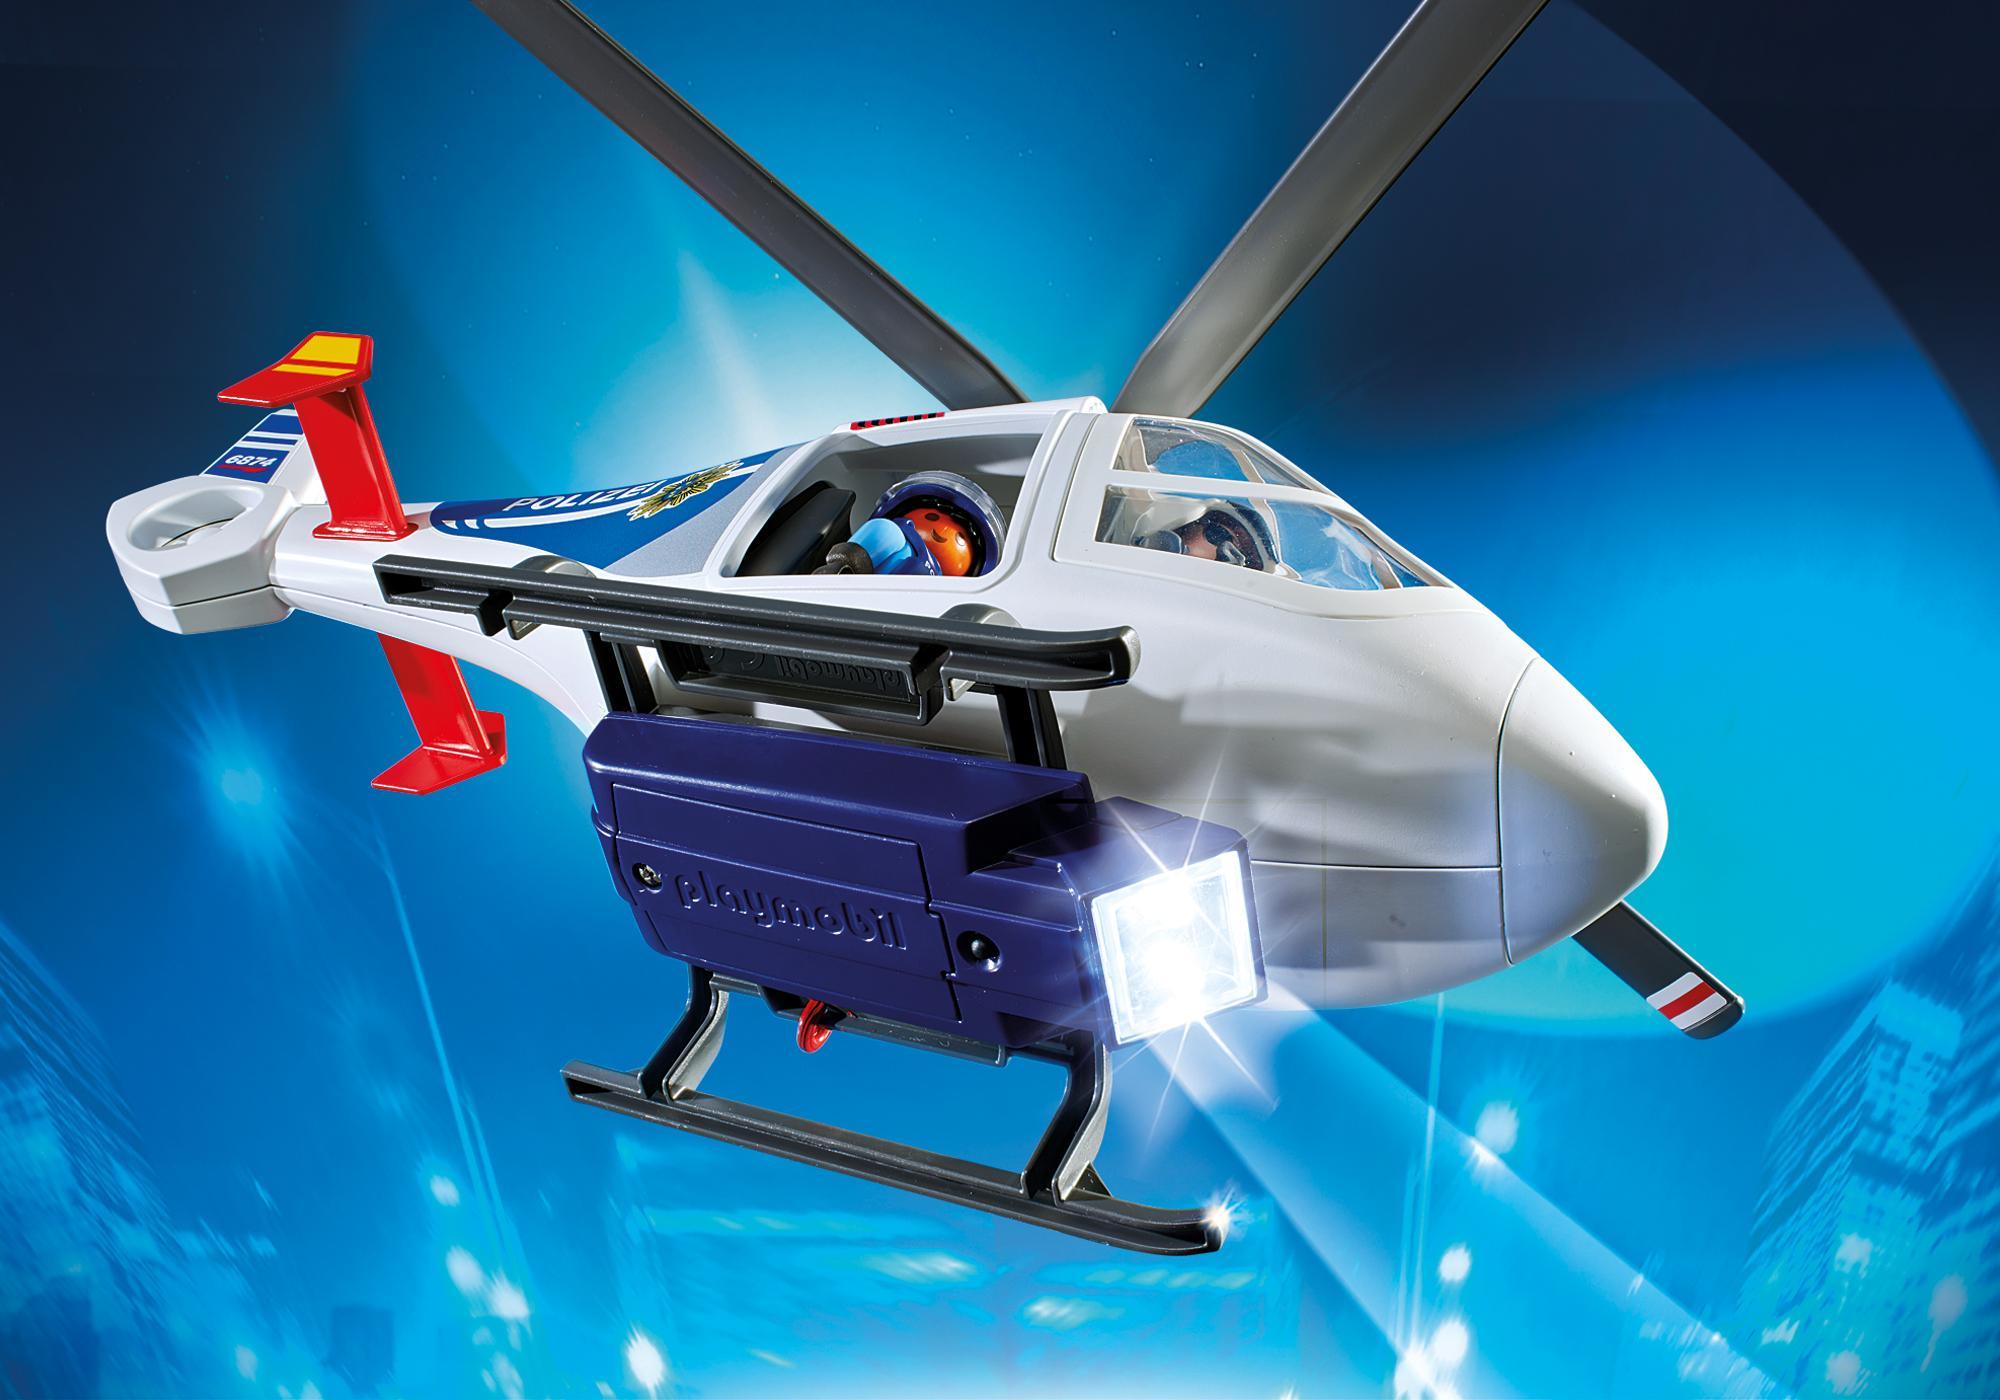 http://media.playmobil.com/i/playmobil/6874_product_extra3/Polizei-Helikopter mit LED-Suchscheinwerfer